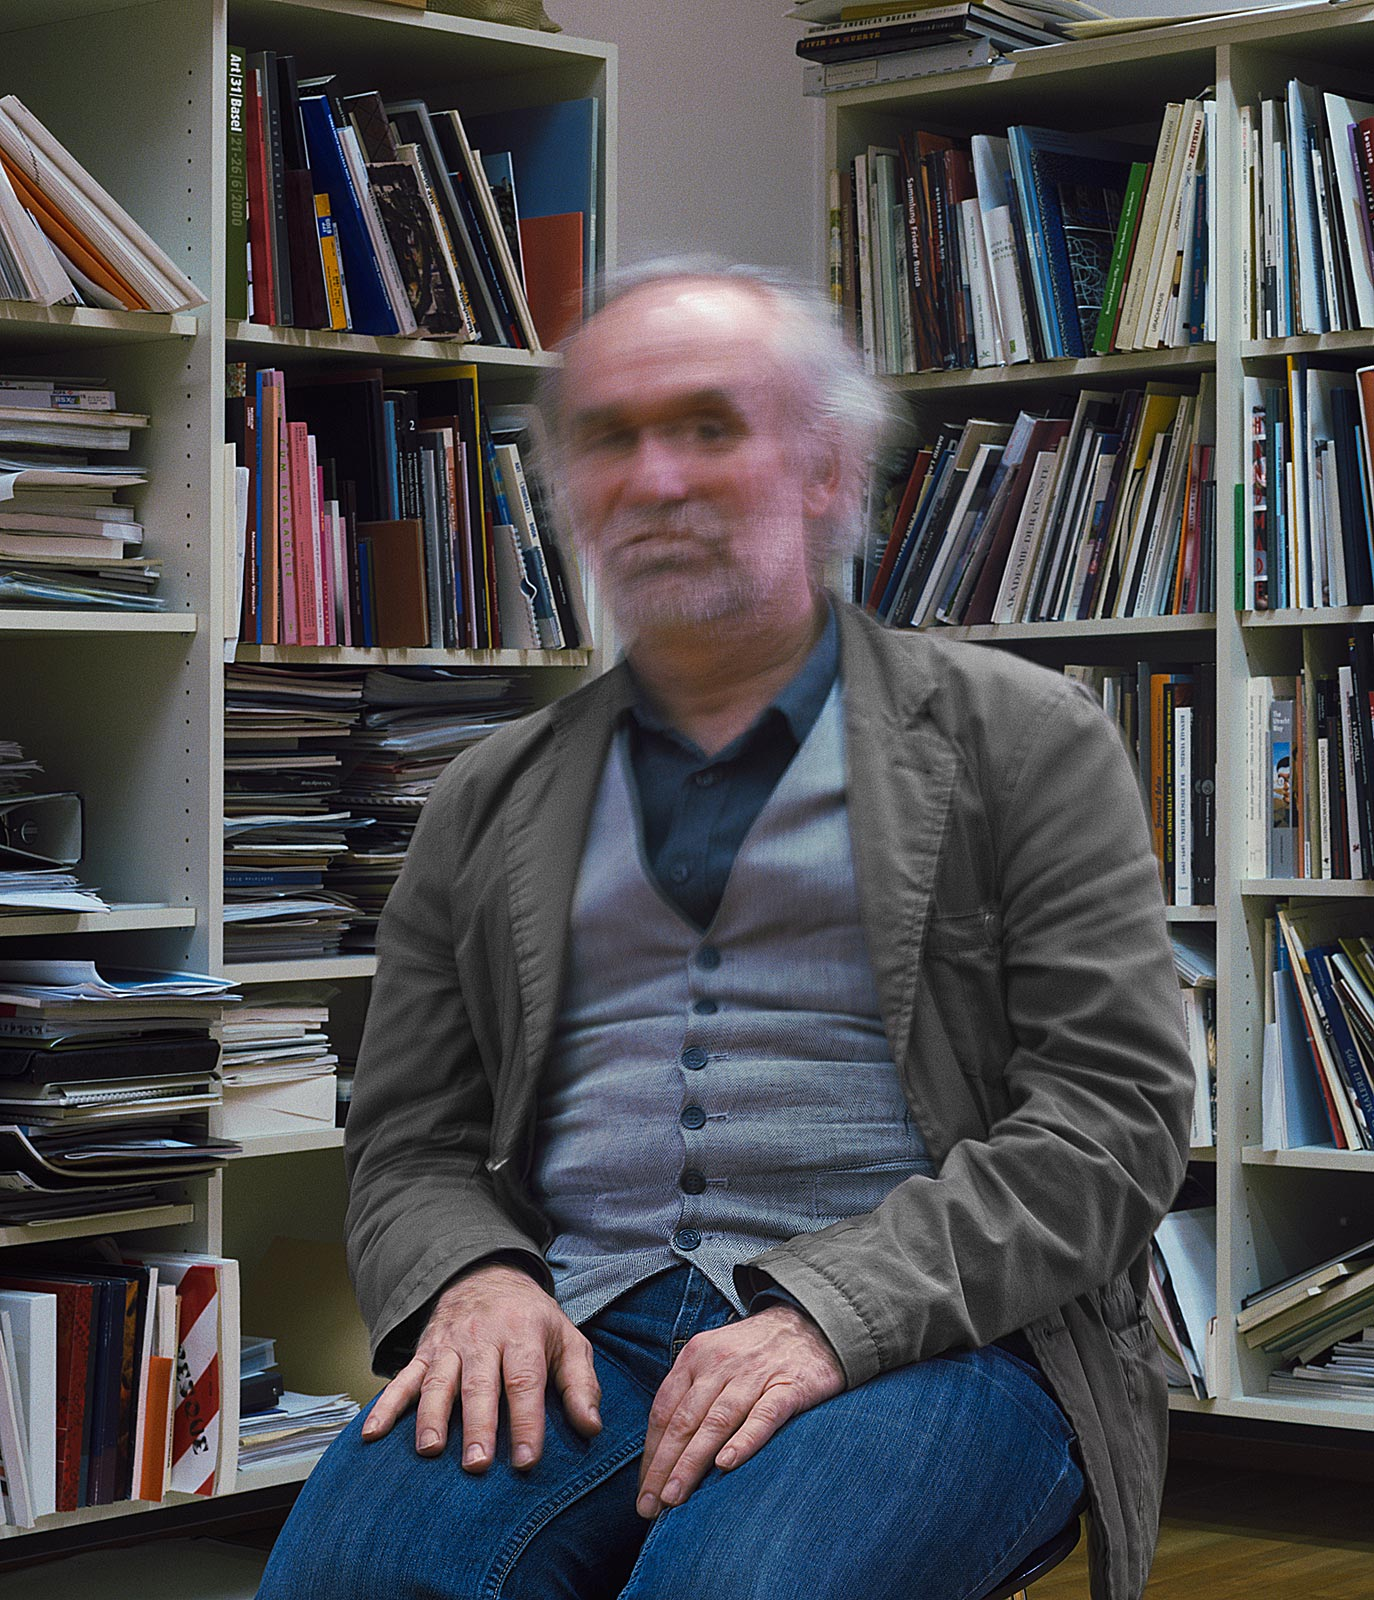 Eugen Blume (10.18. - 10.23 Uhr, 15.1.2009)